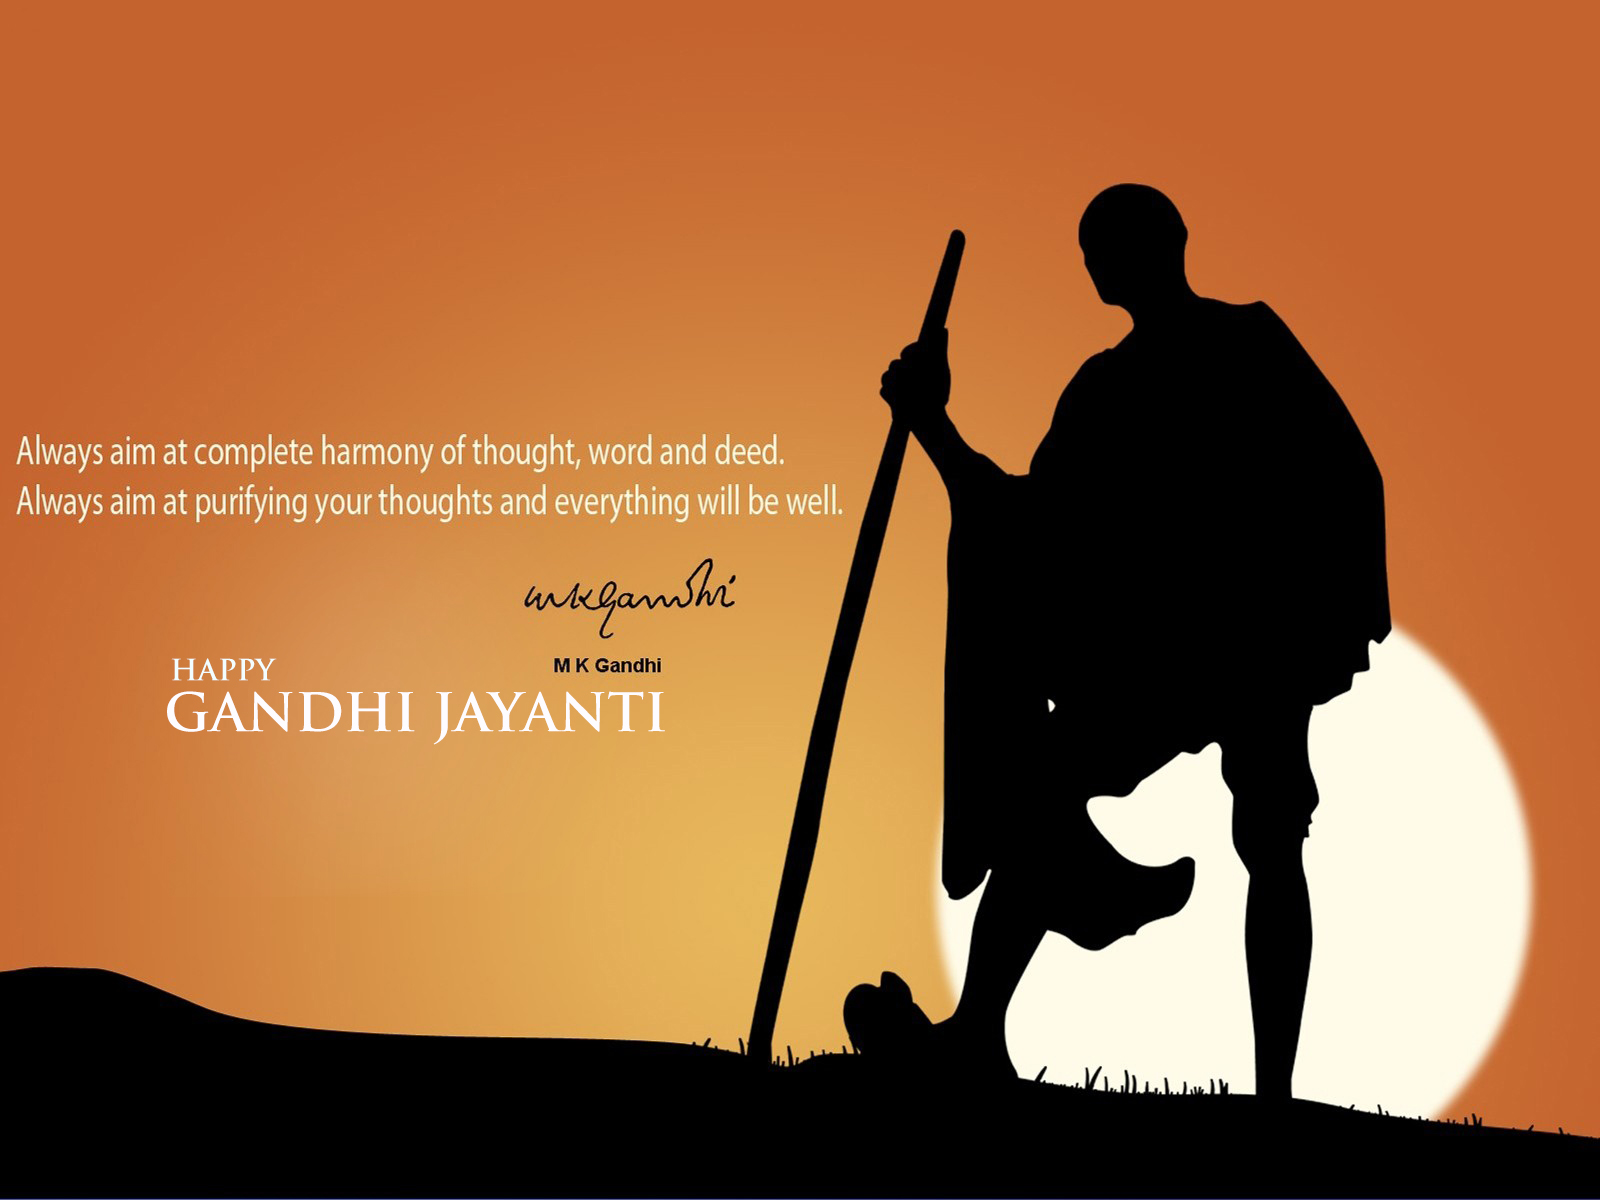 Mahatma Gandhi Jayanti Speech And Quotes 2nd October 2018